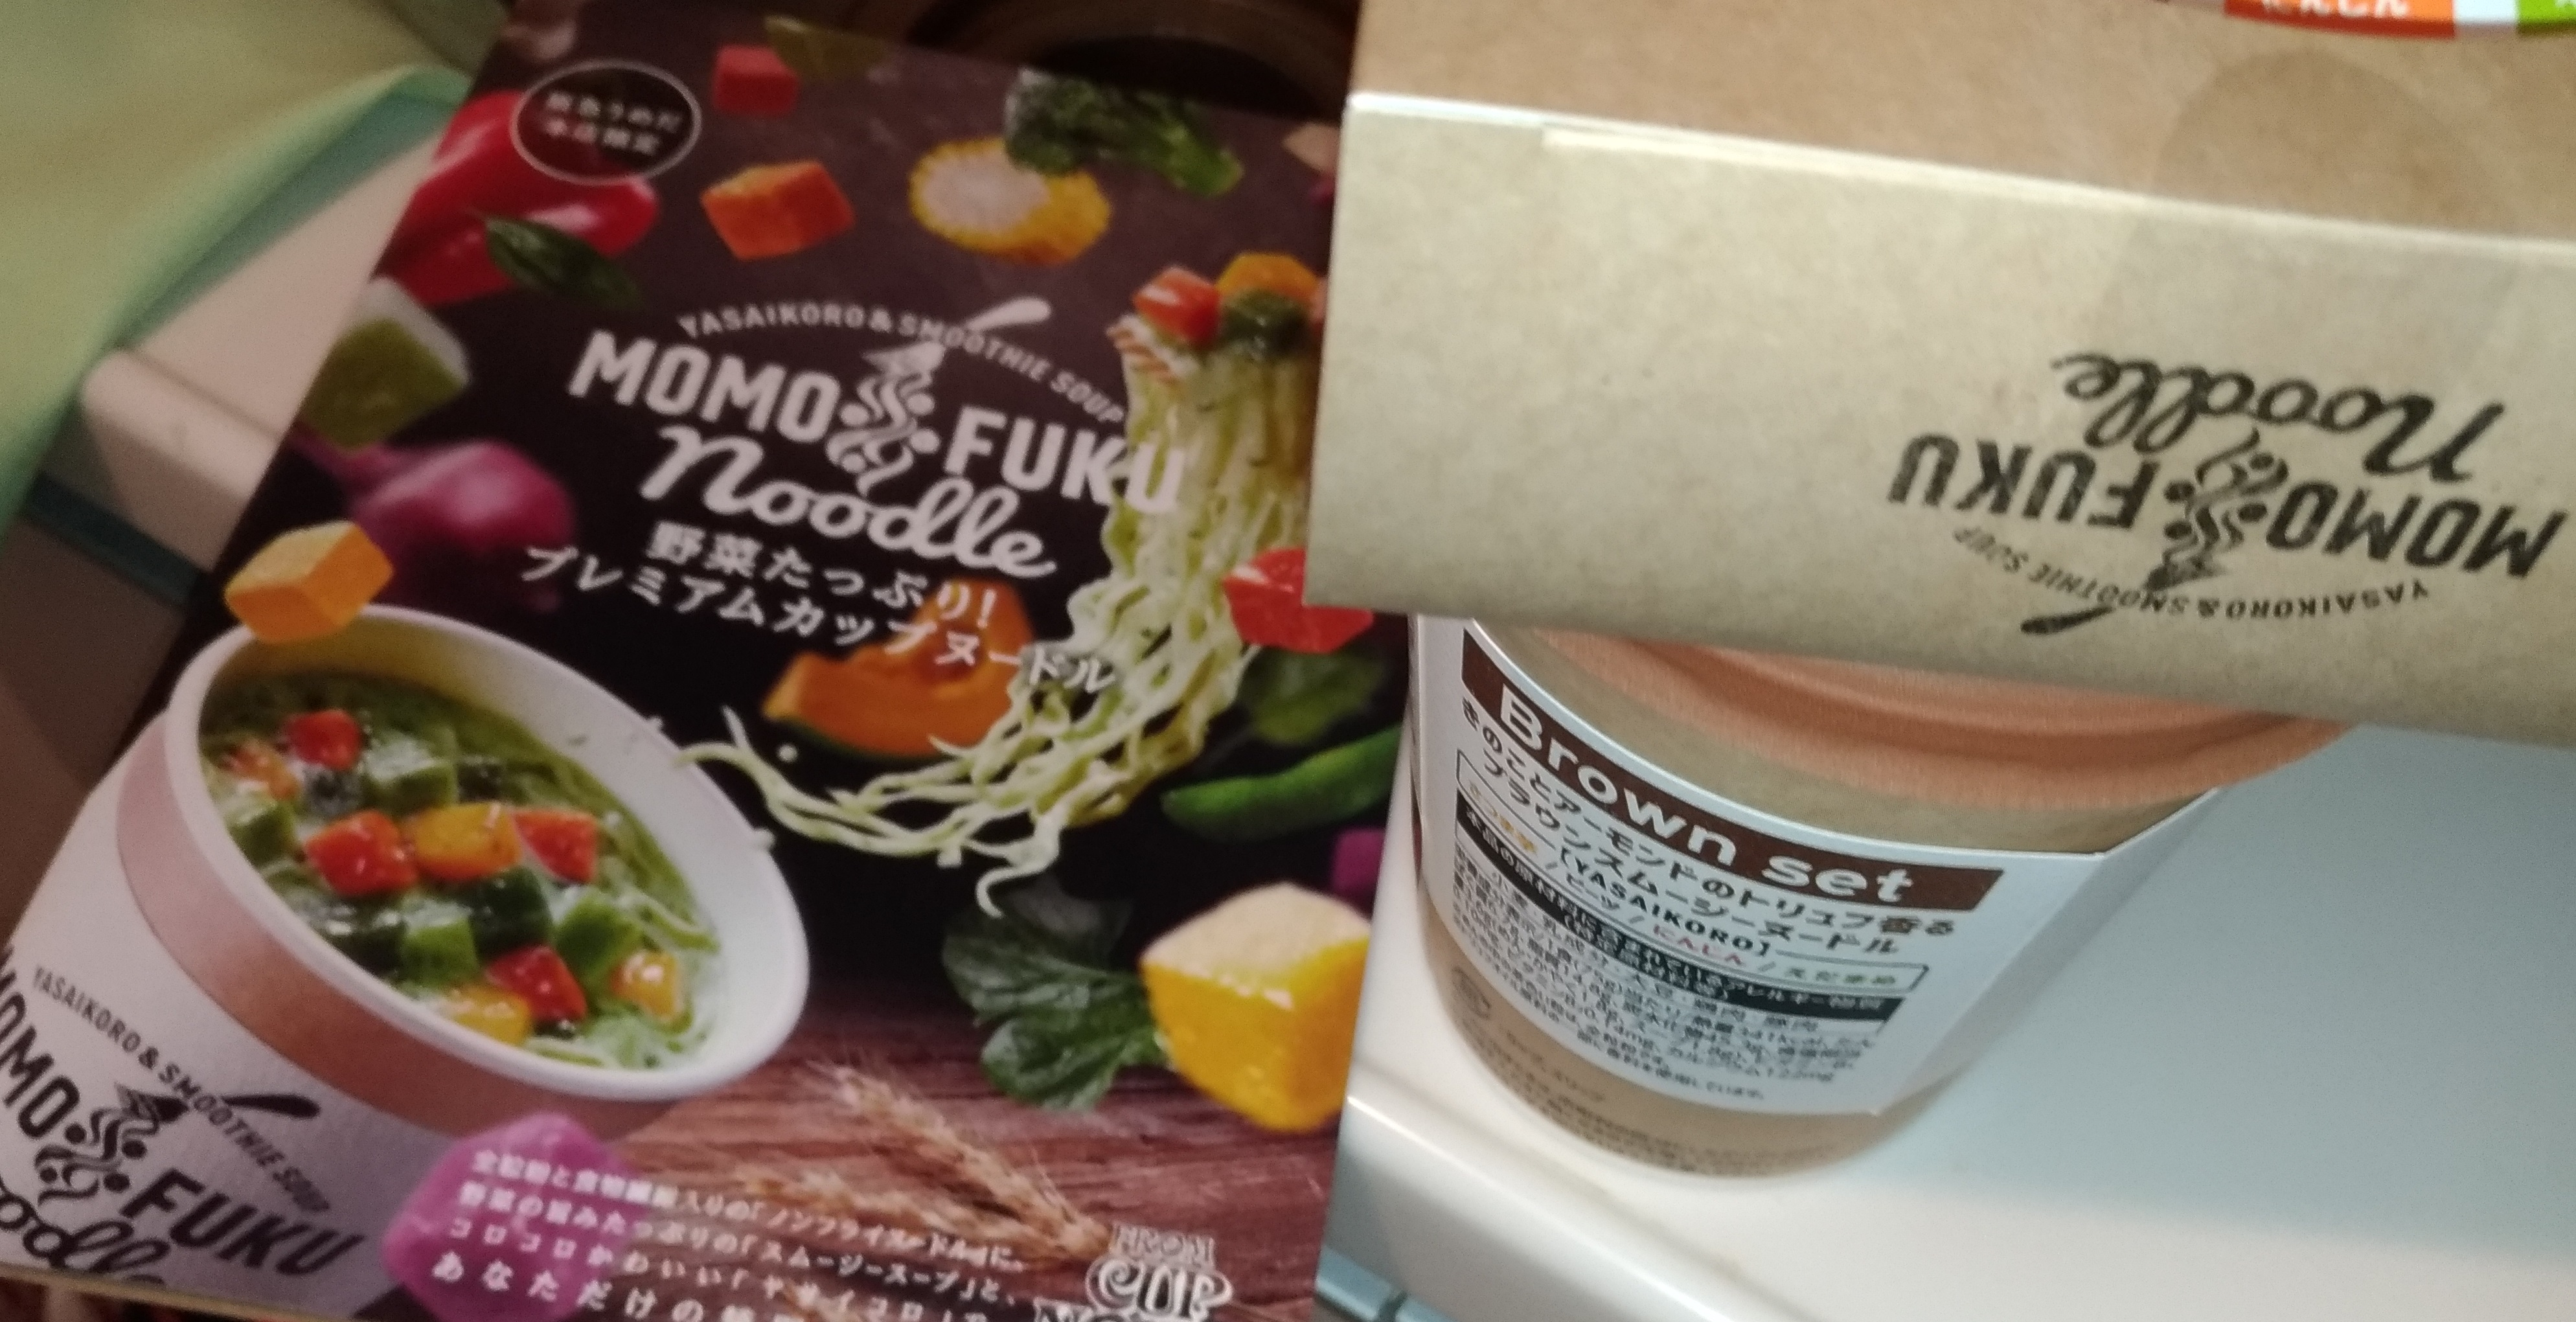 umeda_cup_noodle_hankyu_osaka_2.jpg